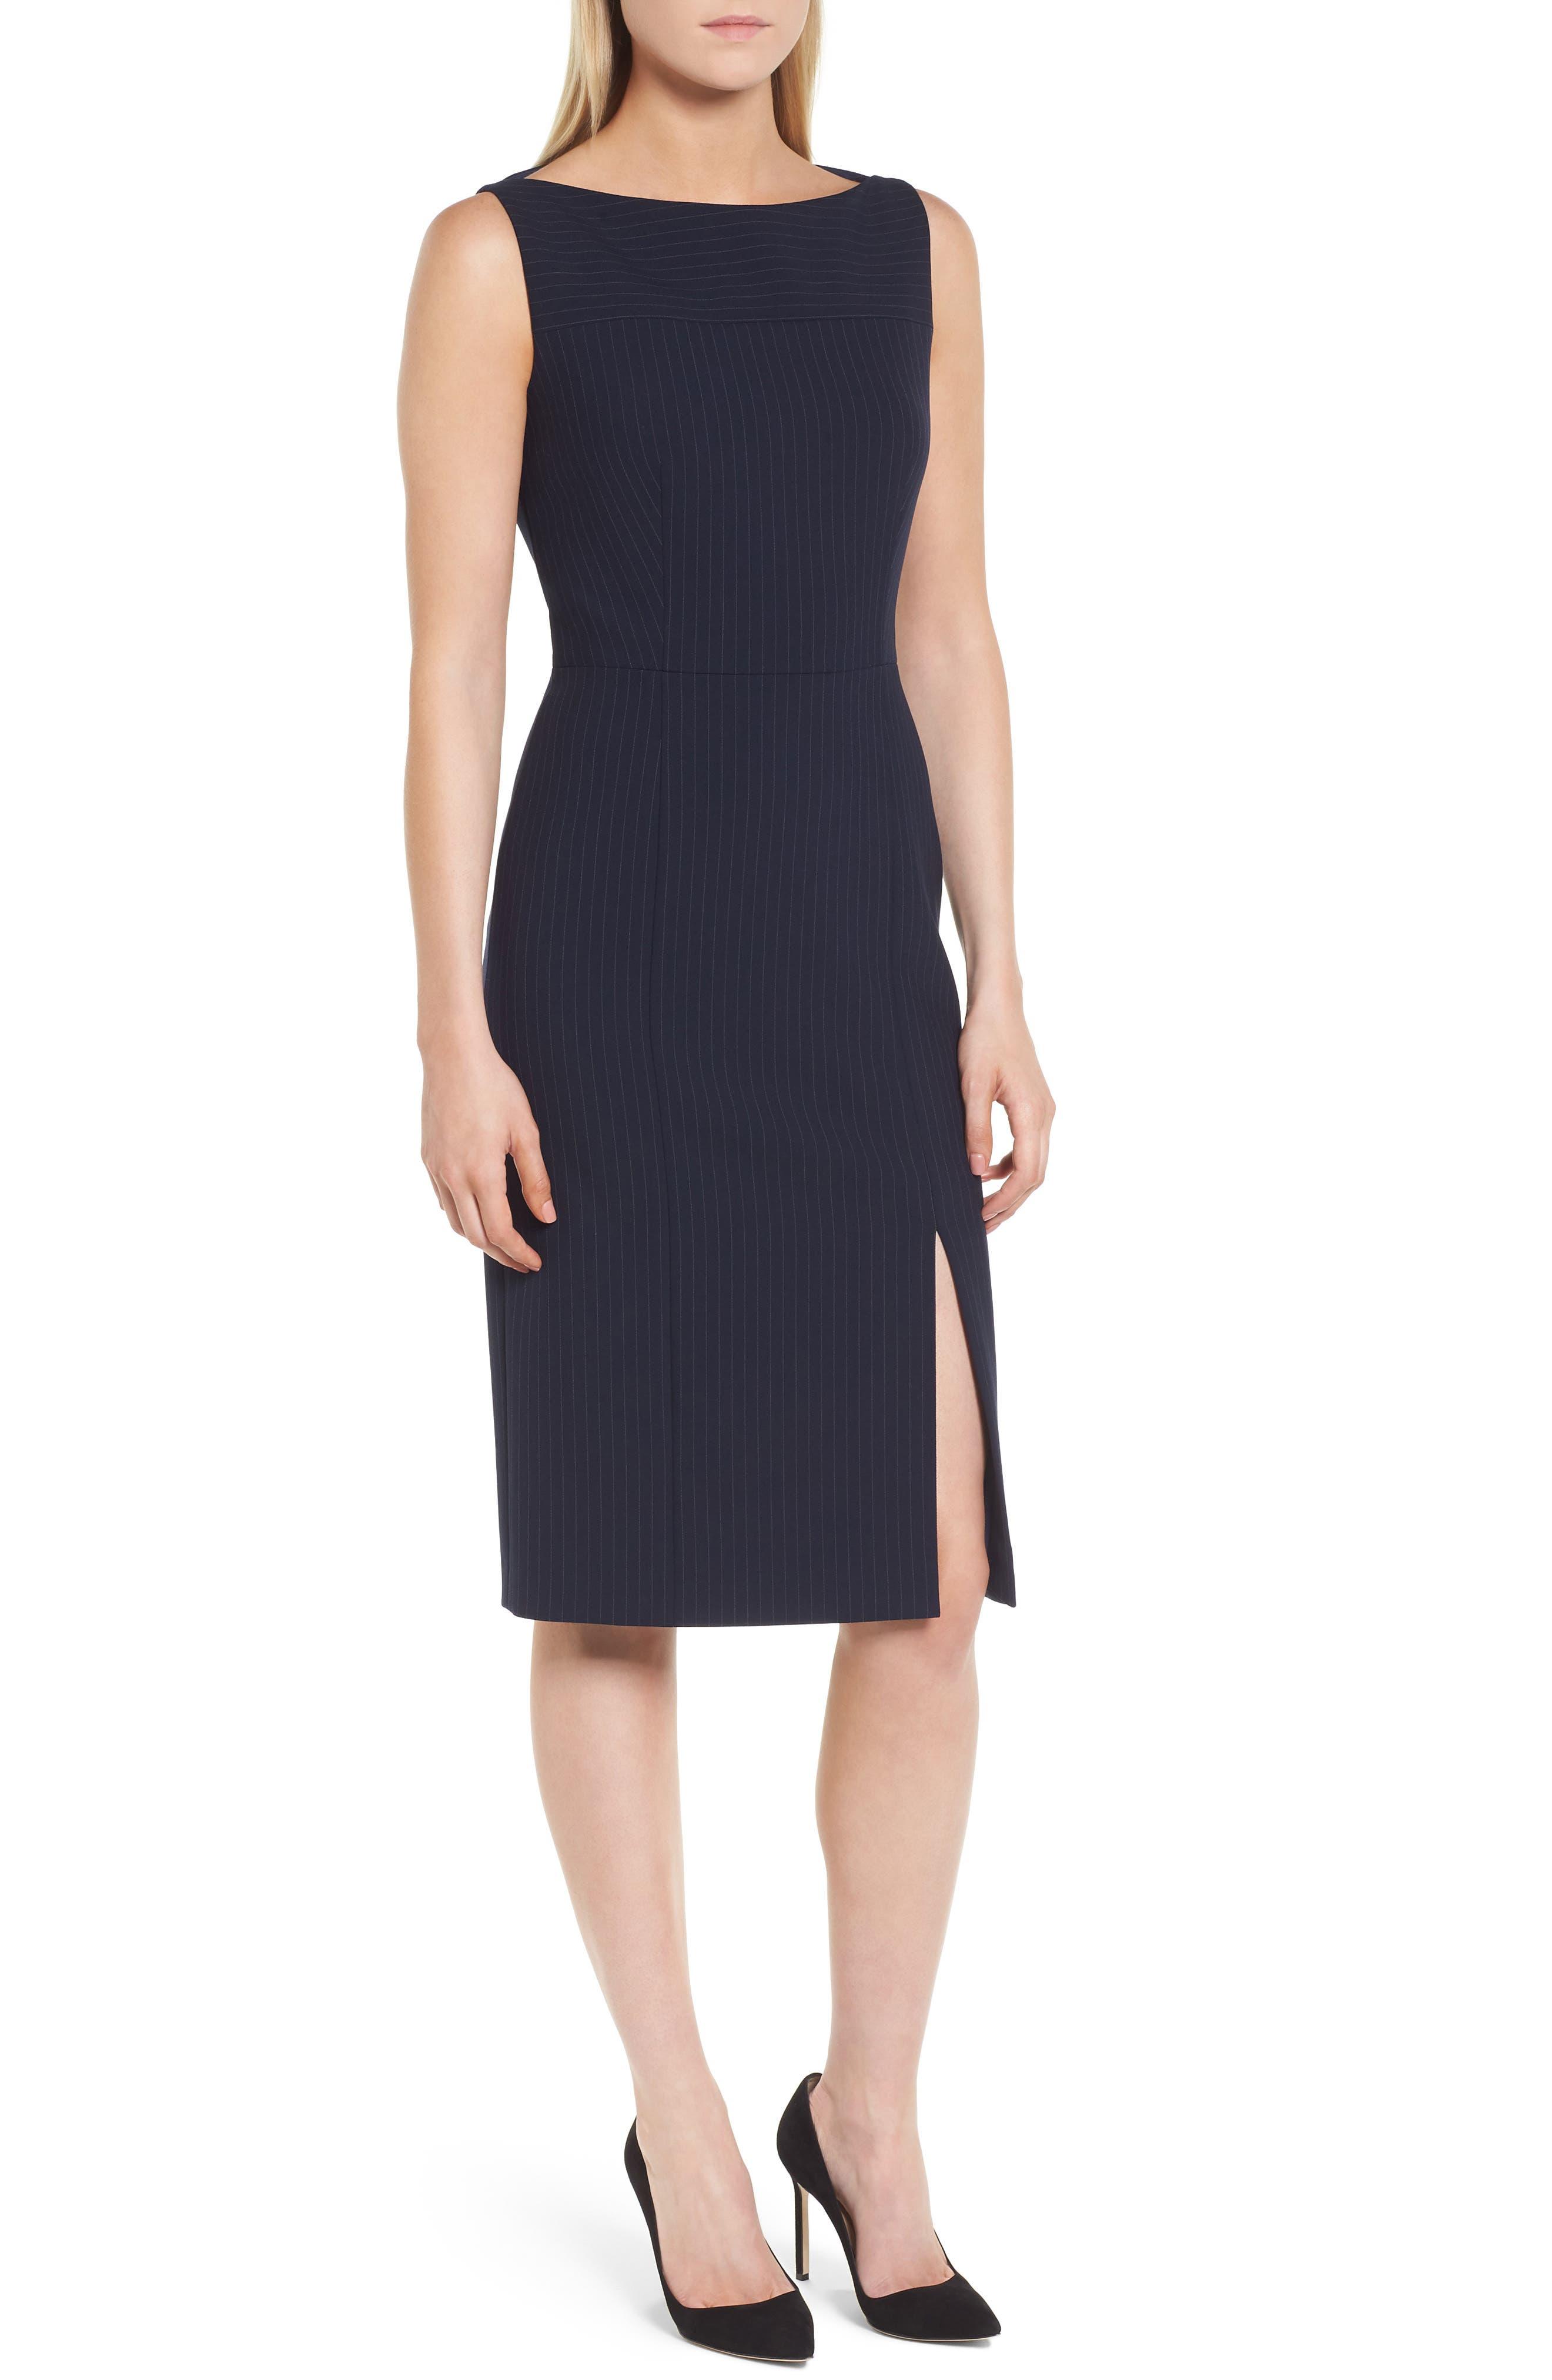 Denaka Pinstripe Sheath Dress,                             Main thumbnail 1, color,                             462